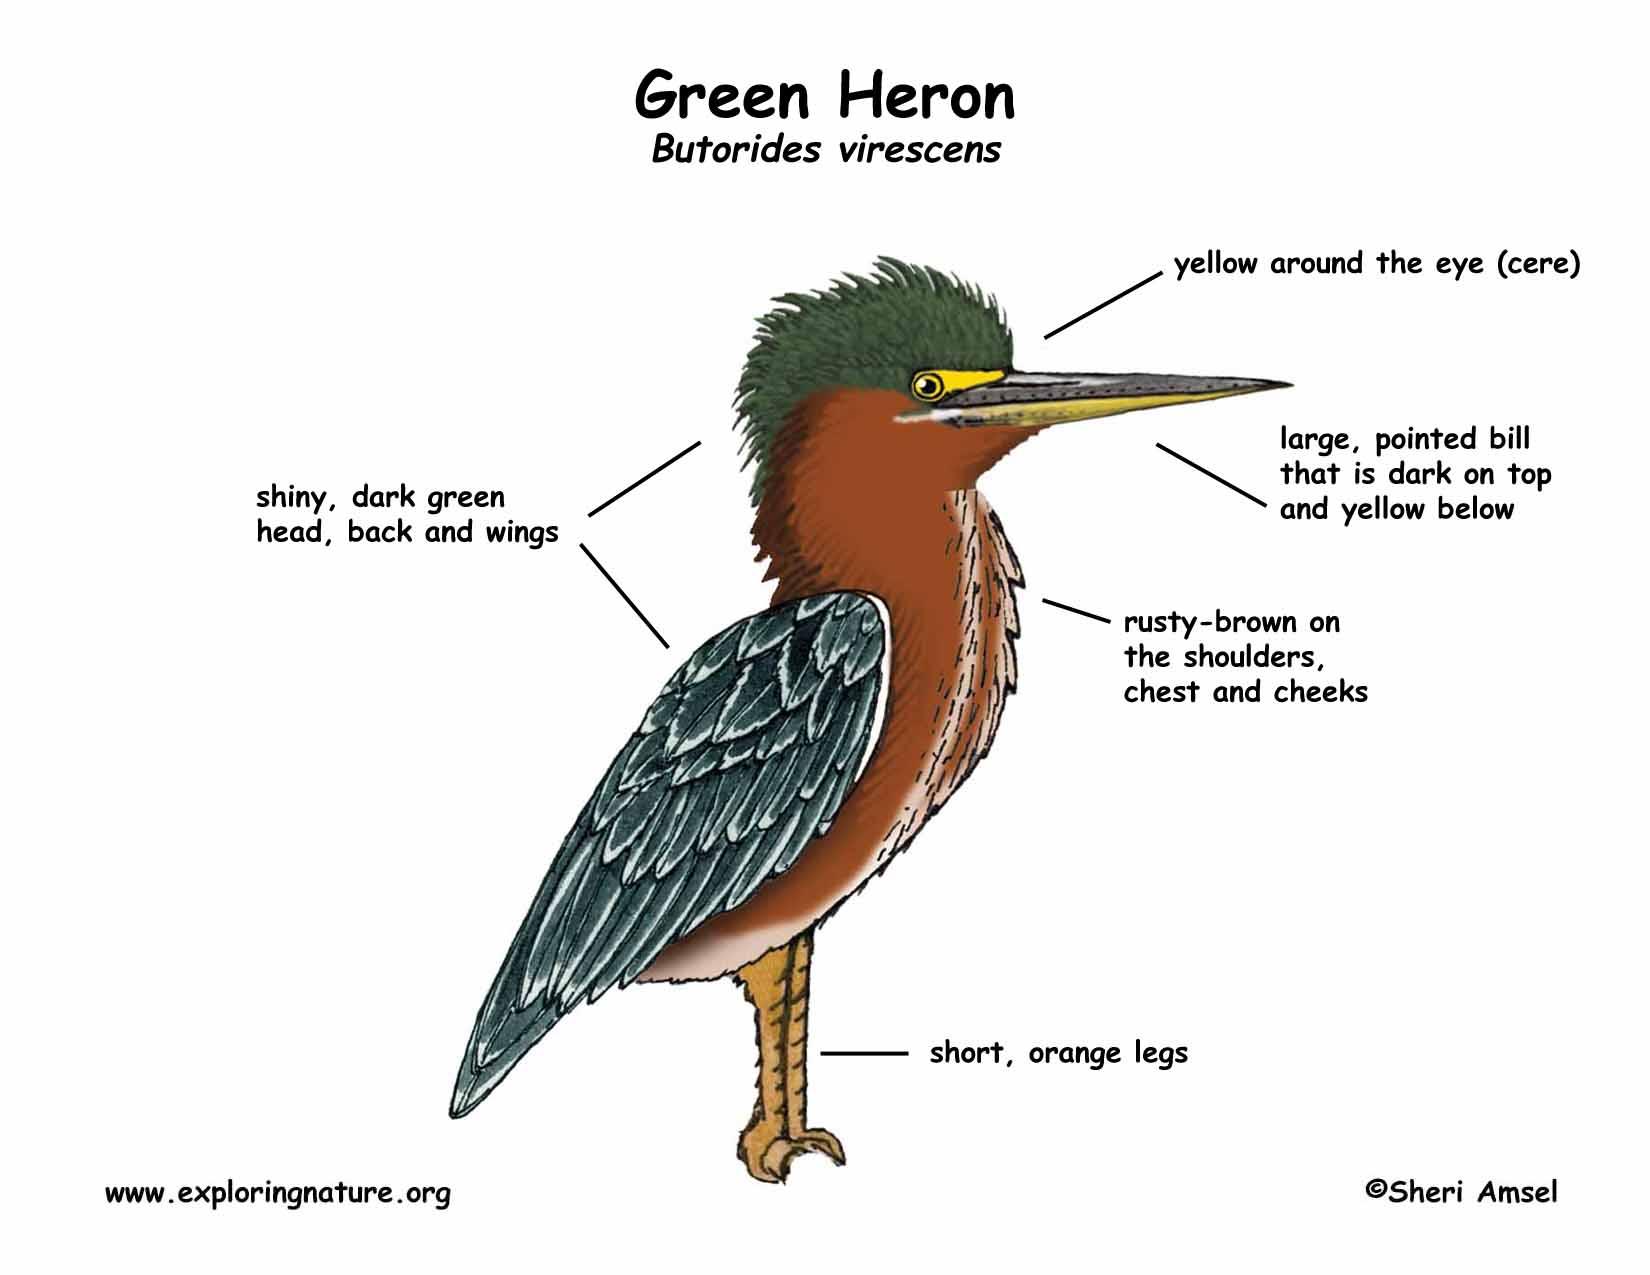 heron green